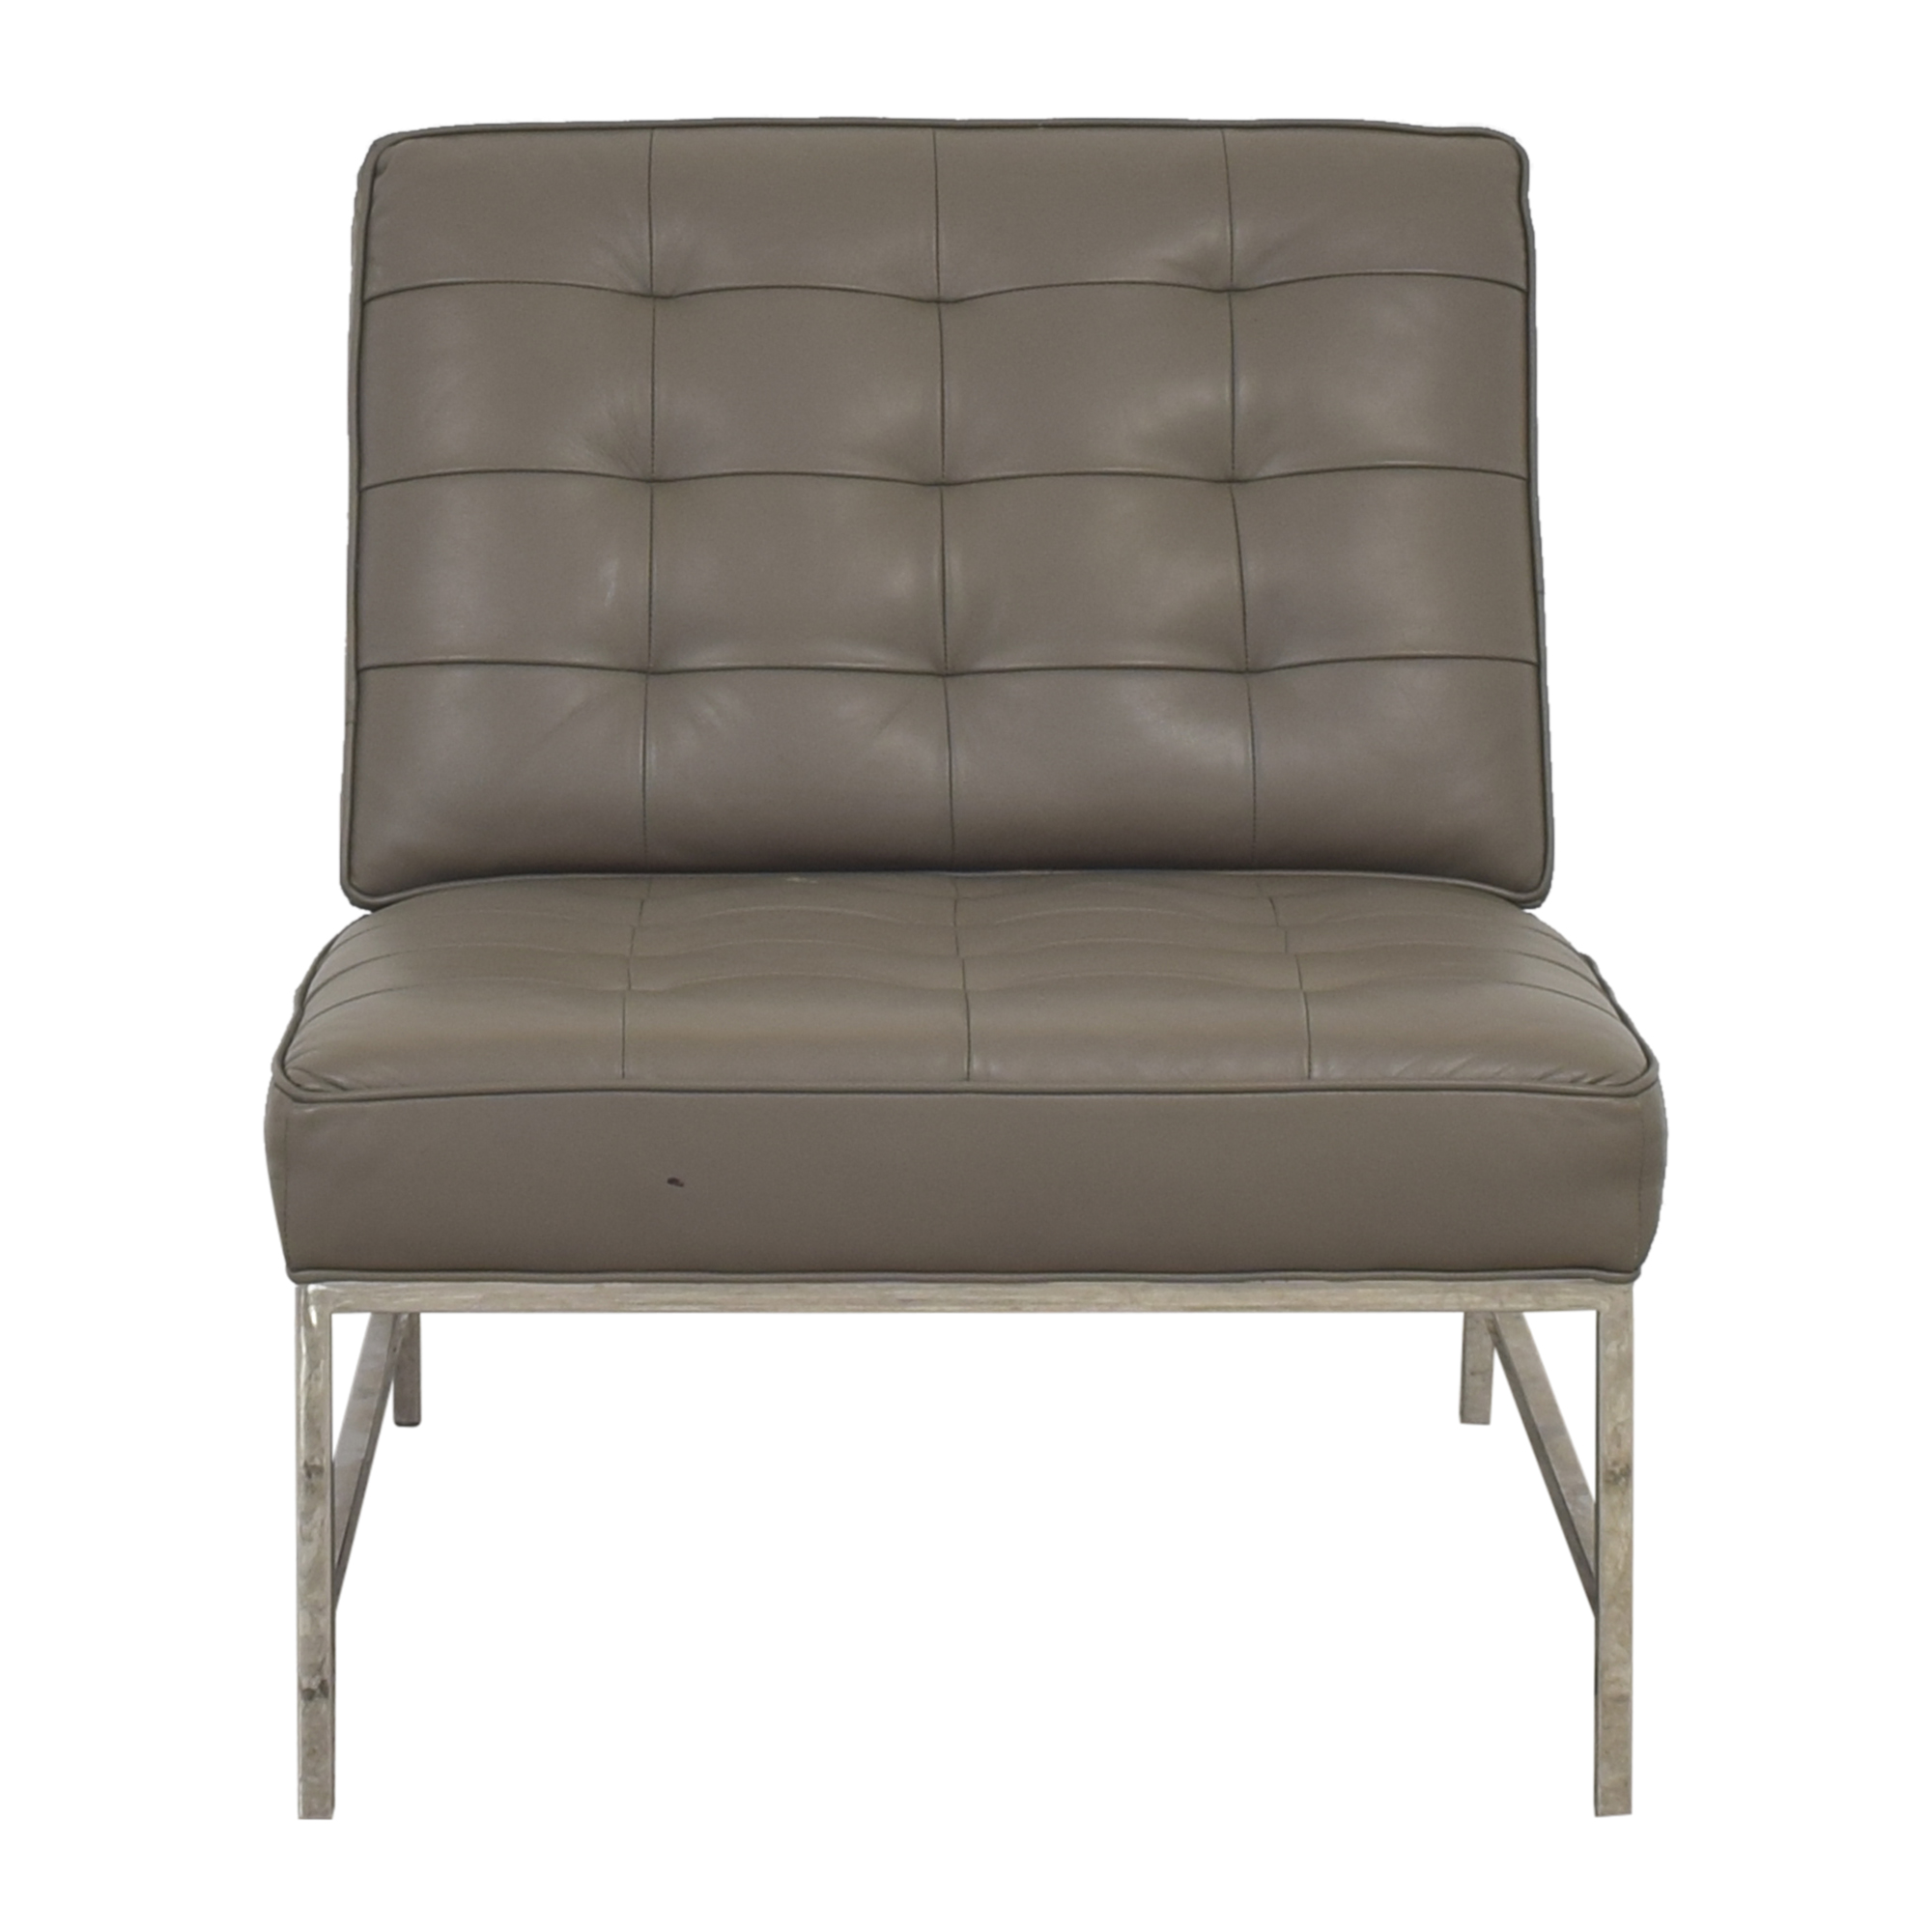 buy Mitchell Gold + Bob Williams Major Chair & Ottoman Mitchell Gold + Bob Williams